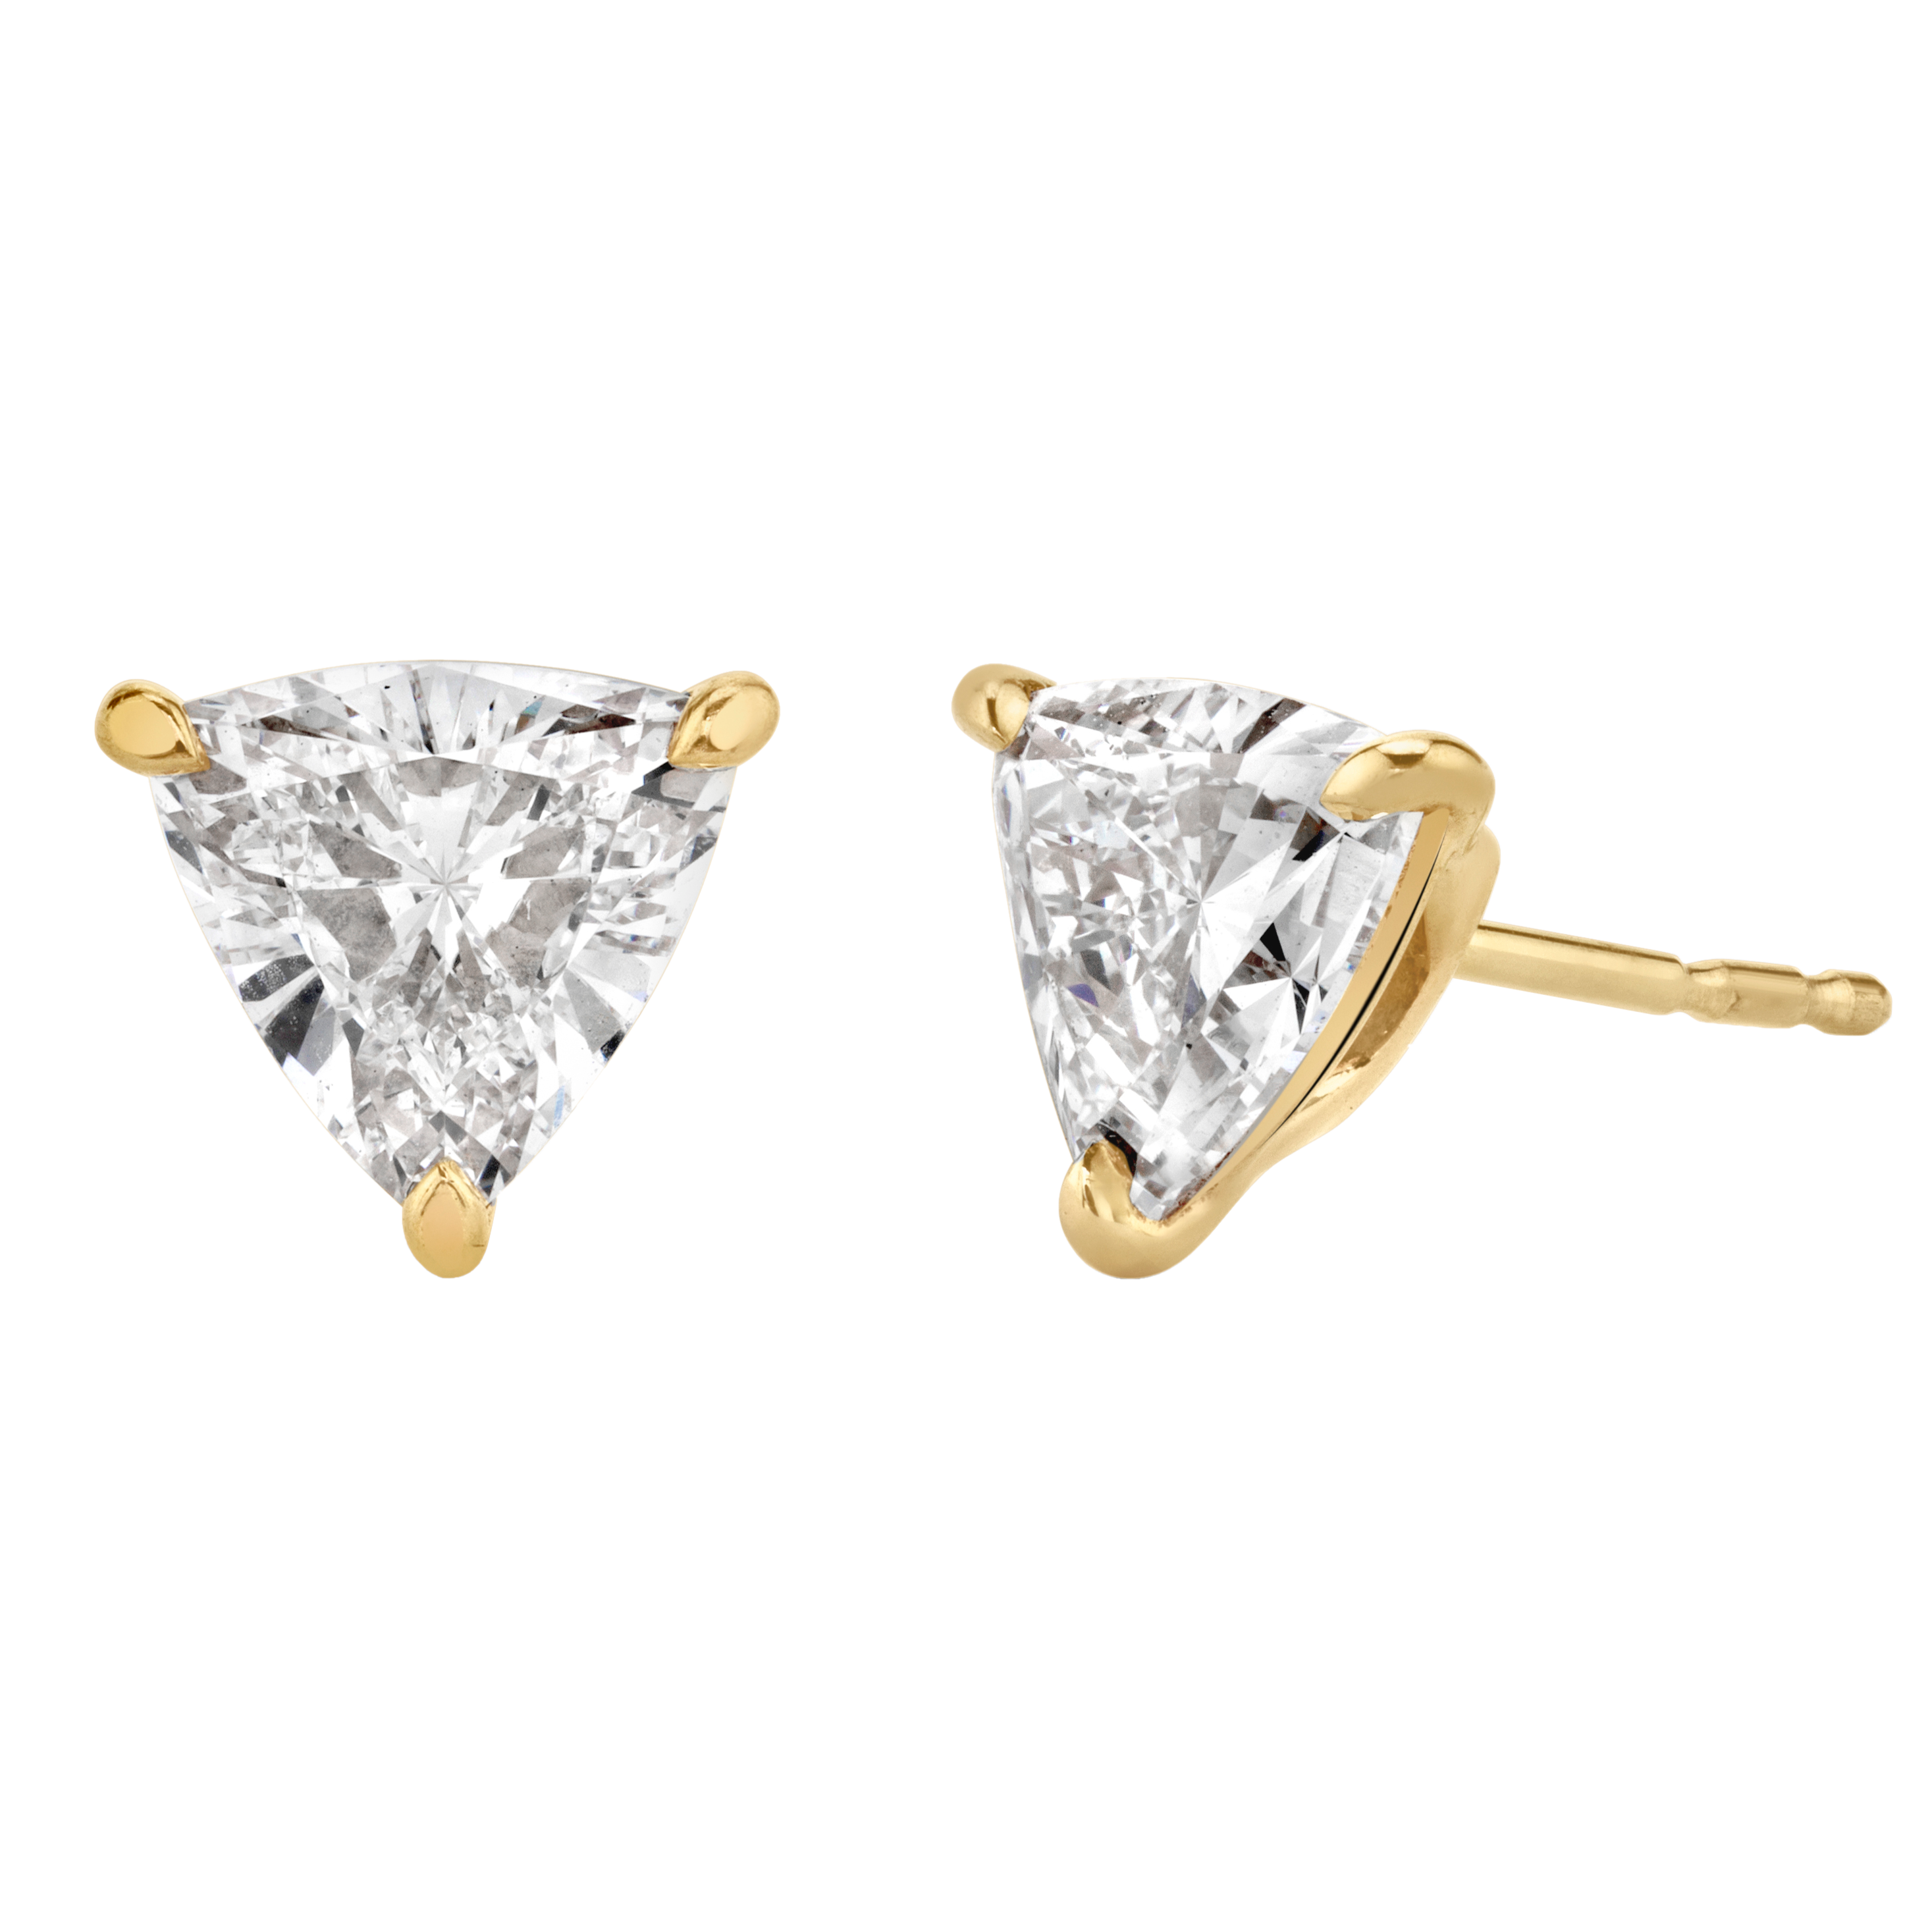 Solitaire Trillion Diamond Studs